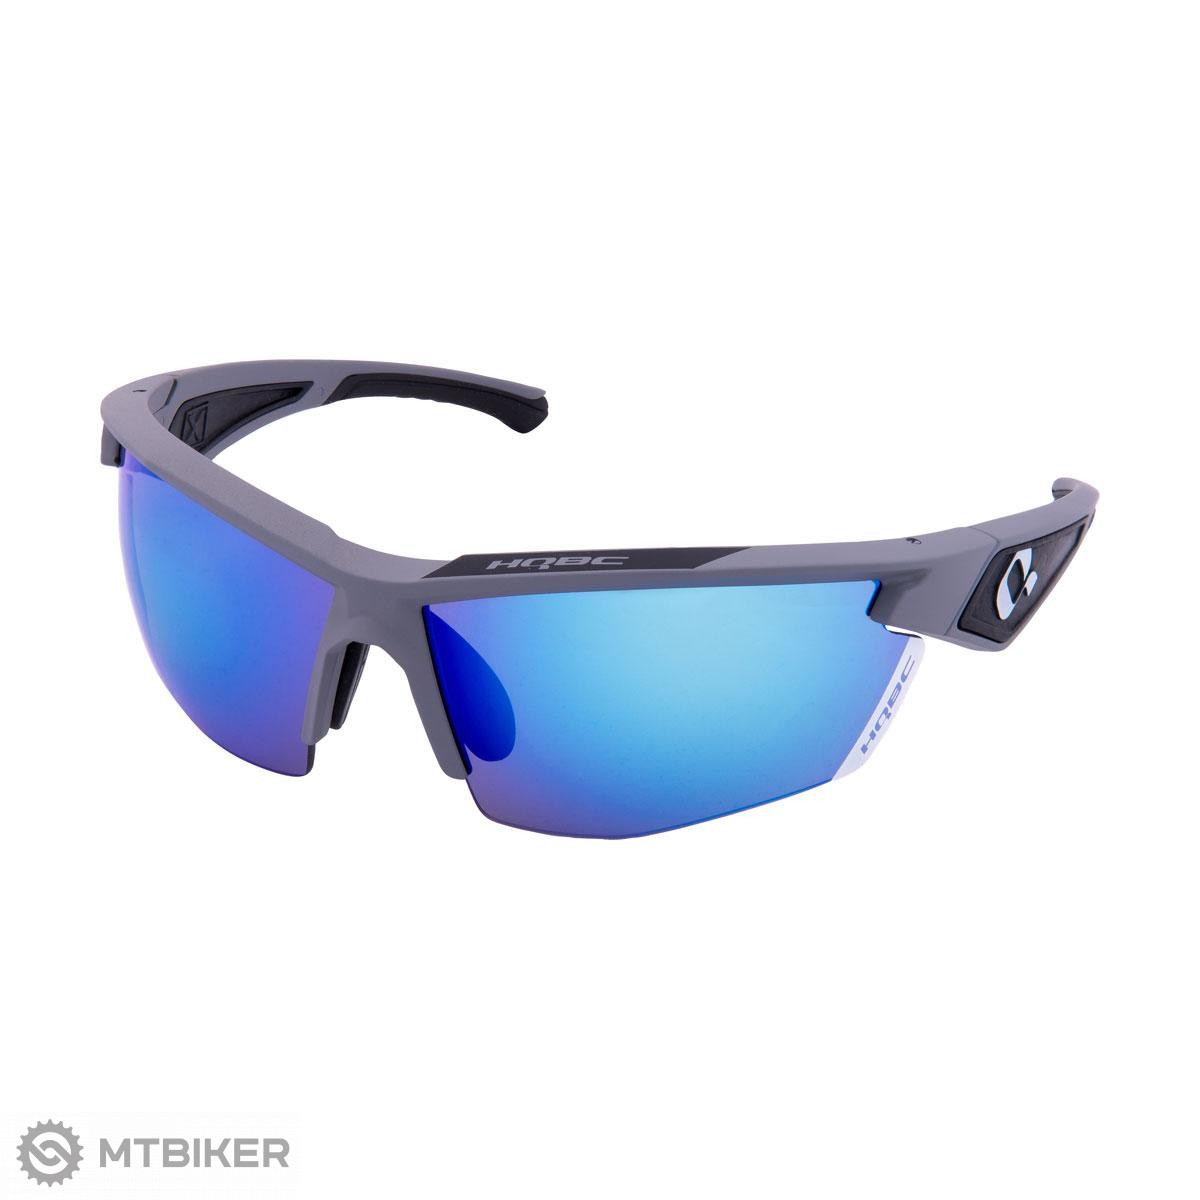 c56cbda70 Hqbc okuliare QX5 sivá/čierna Photochromic - MTBIKER Shop